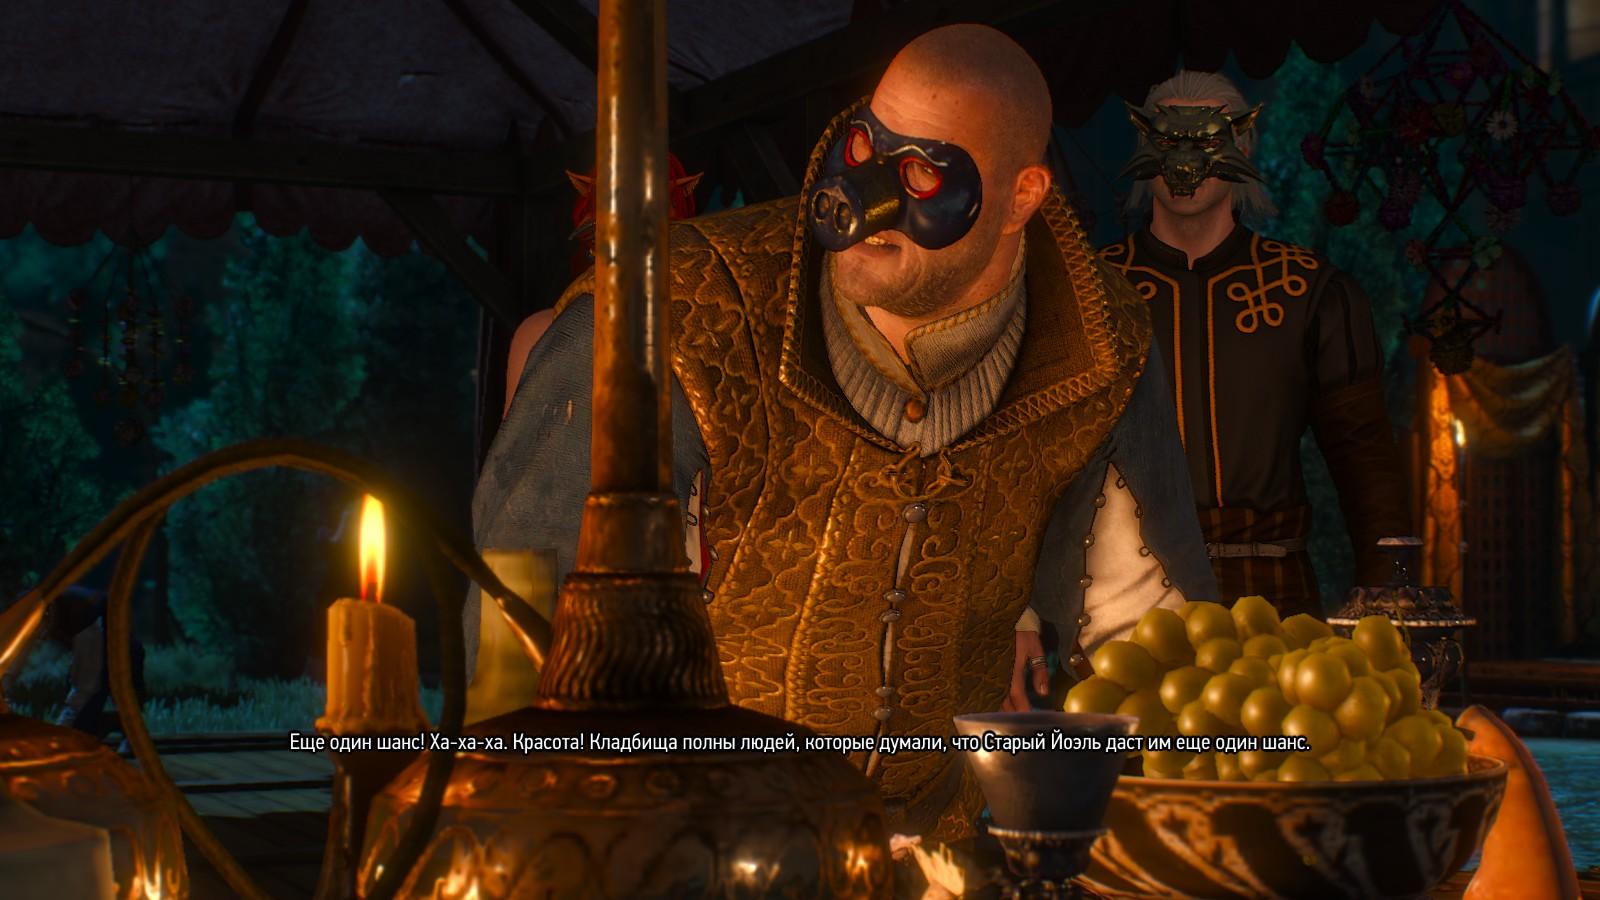 Геральт - Witcher 3: Wild Hunt, the Велен, Новиград, Персонаж